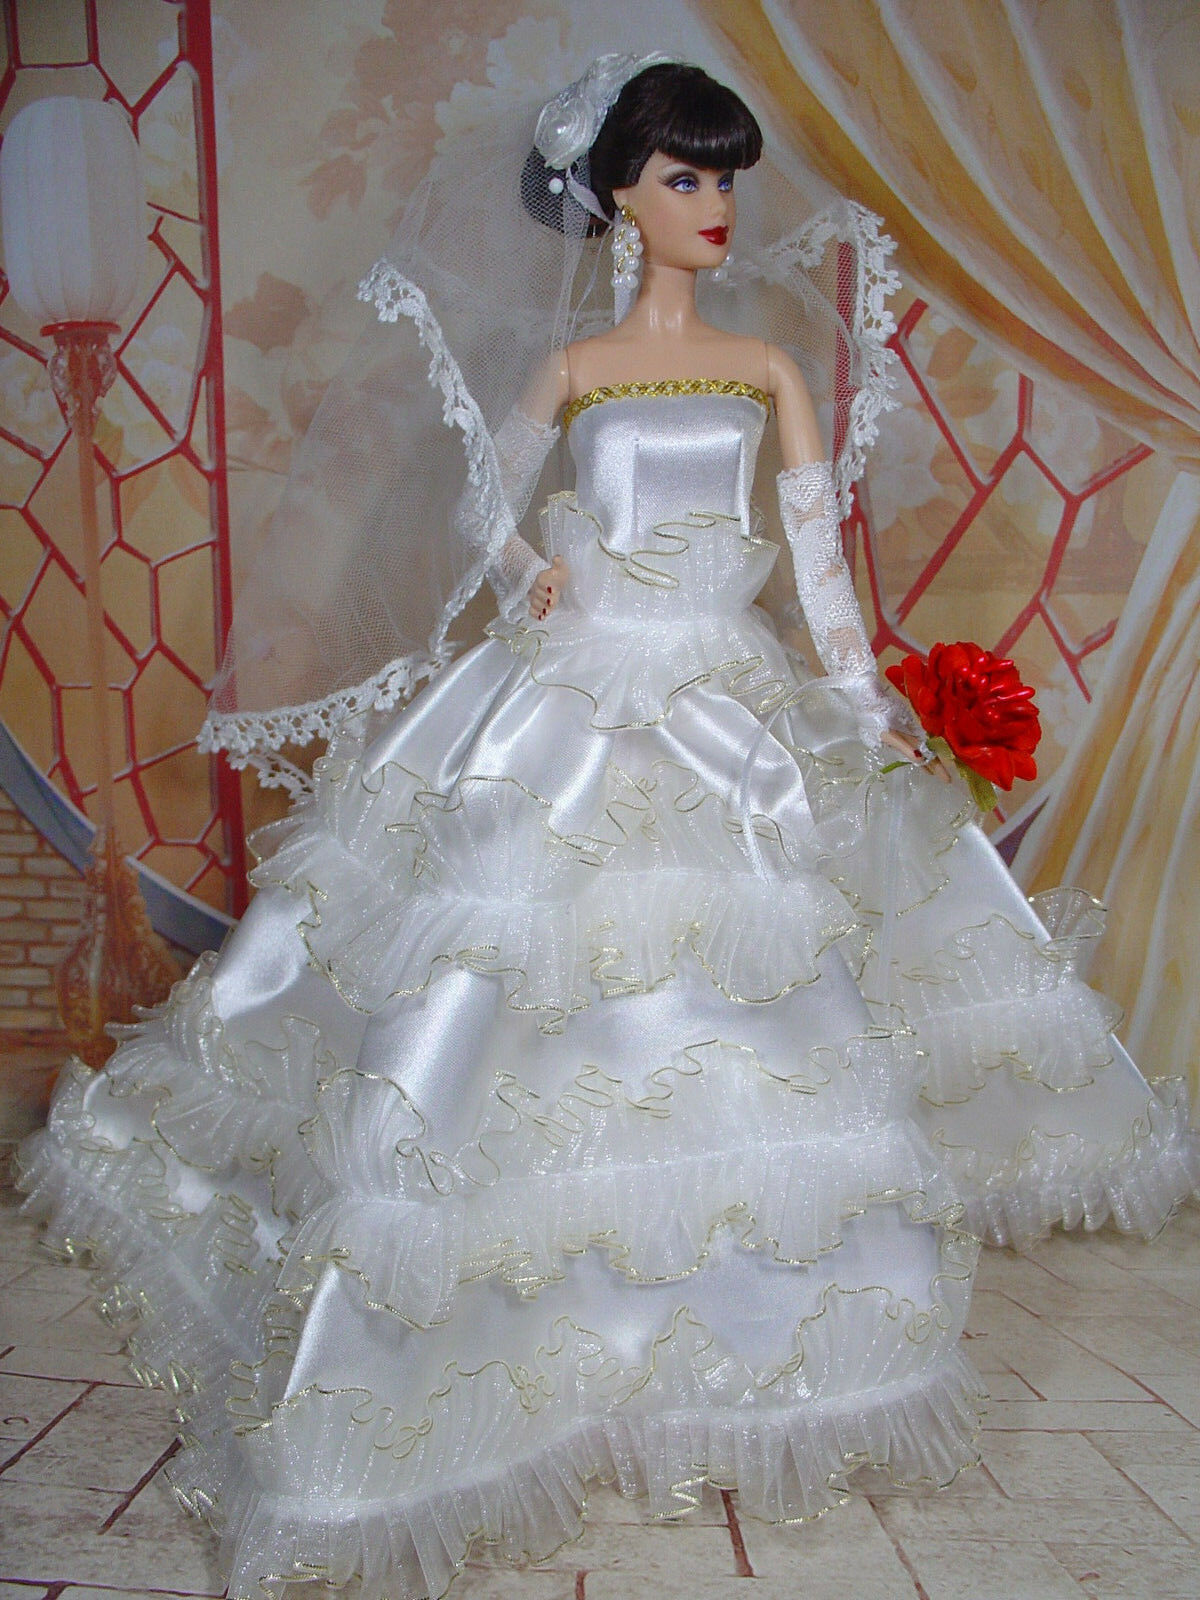 BARBIE DOLL ROBE DE MARIÉE MARIÉE MARIÉE WEDDING GOWN BRIDE   05670 d6e77a